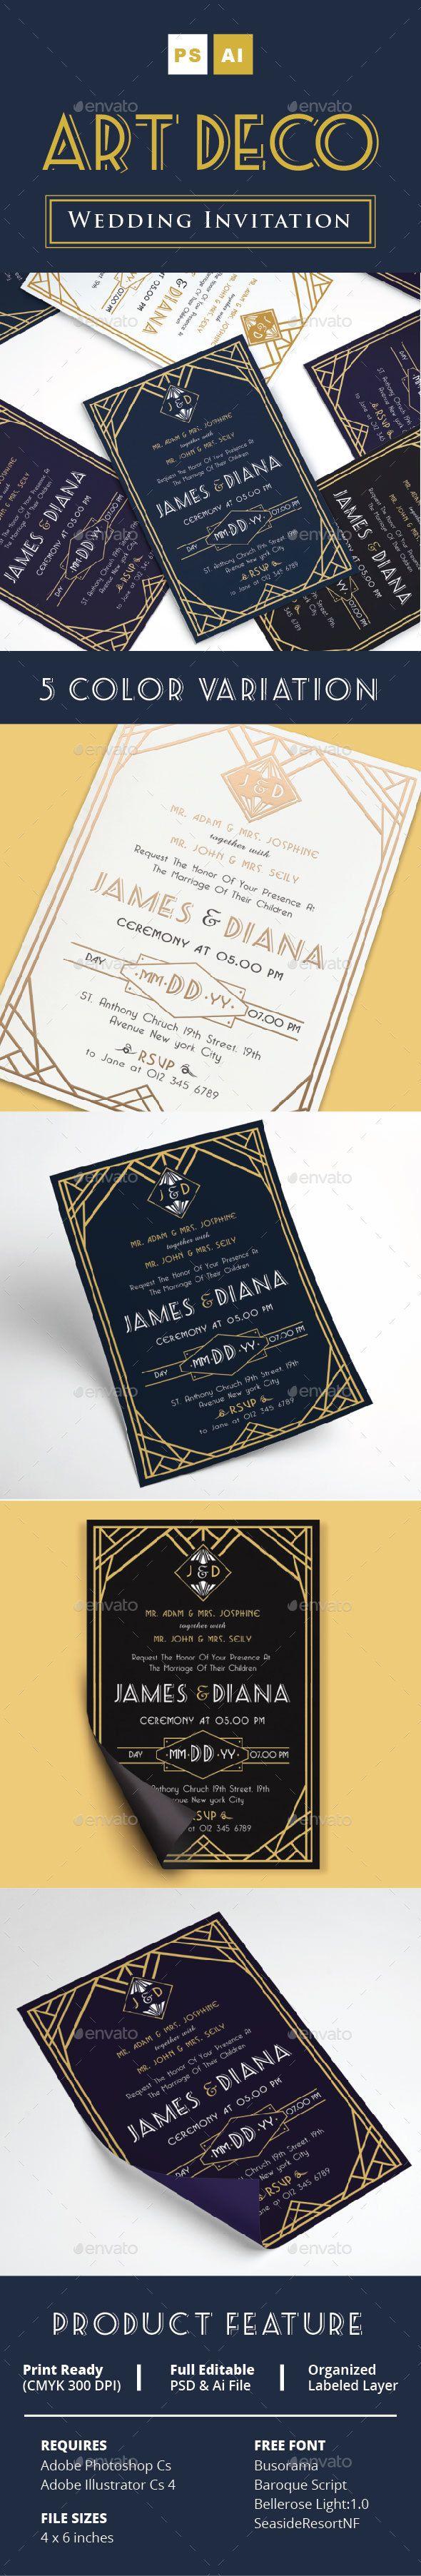 marriage invitation sms on mobile%0A Art Deco Wedding Invitation Vol